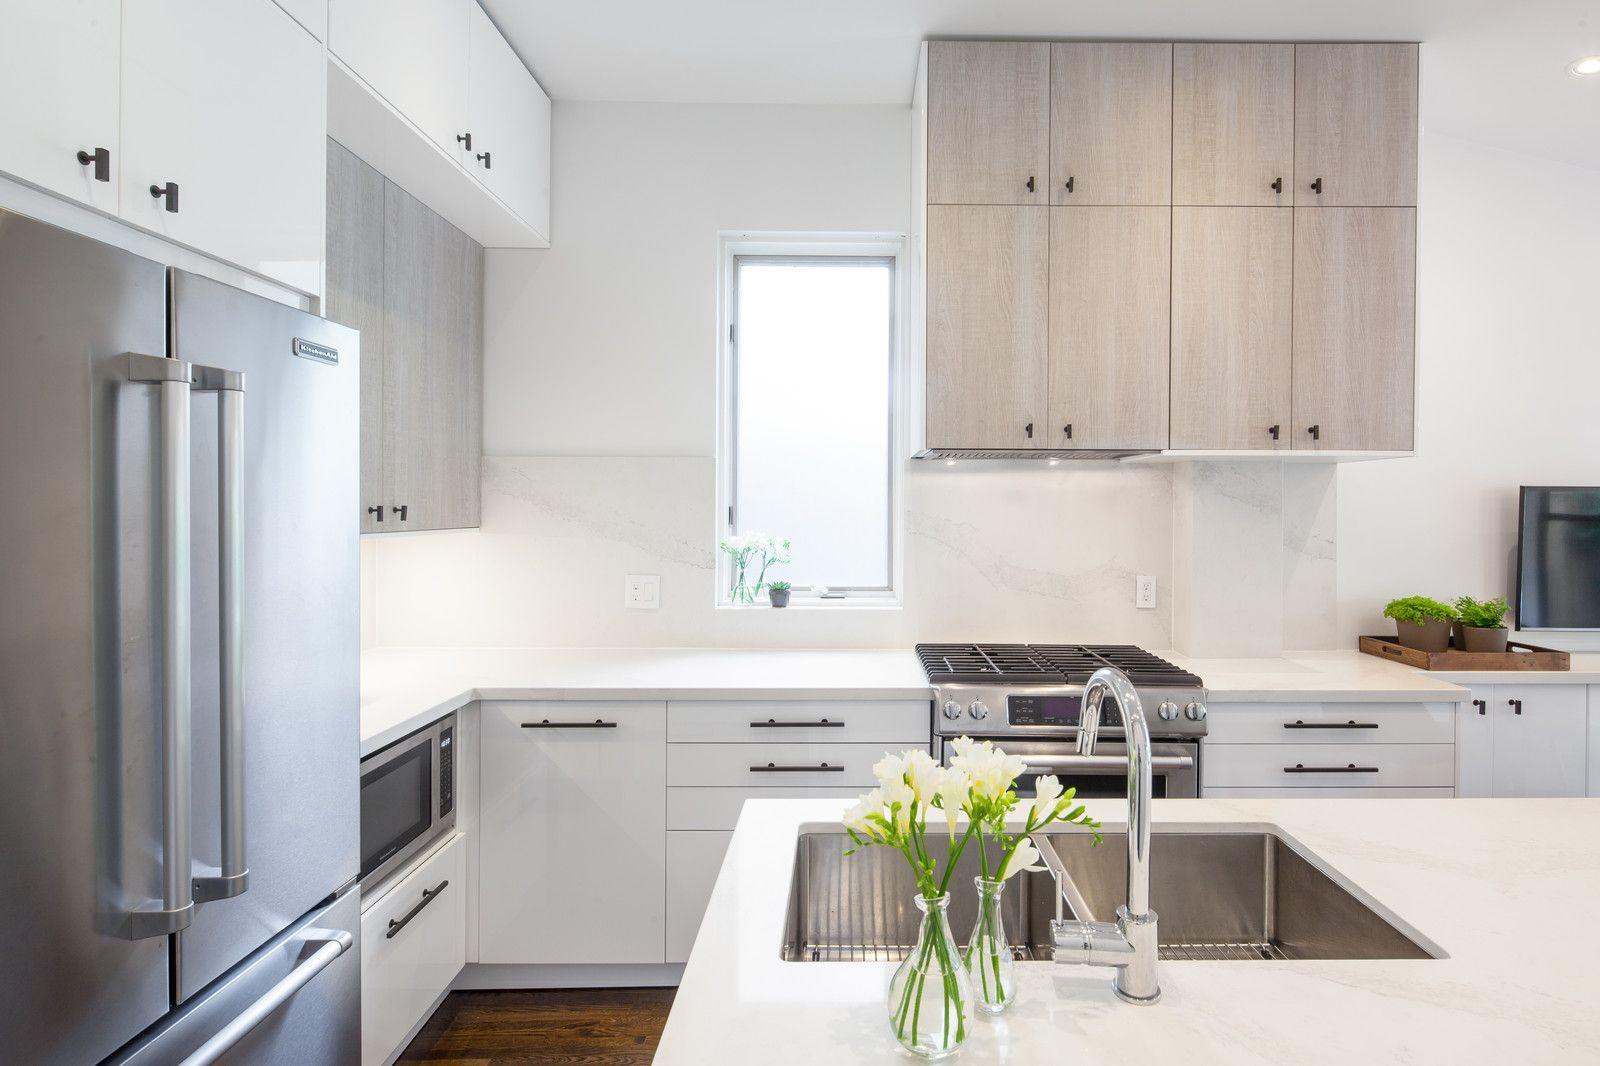 Eatin kitchen midsized modern lshaped medium tone wood floor